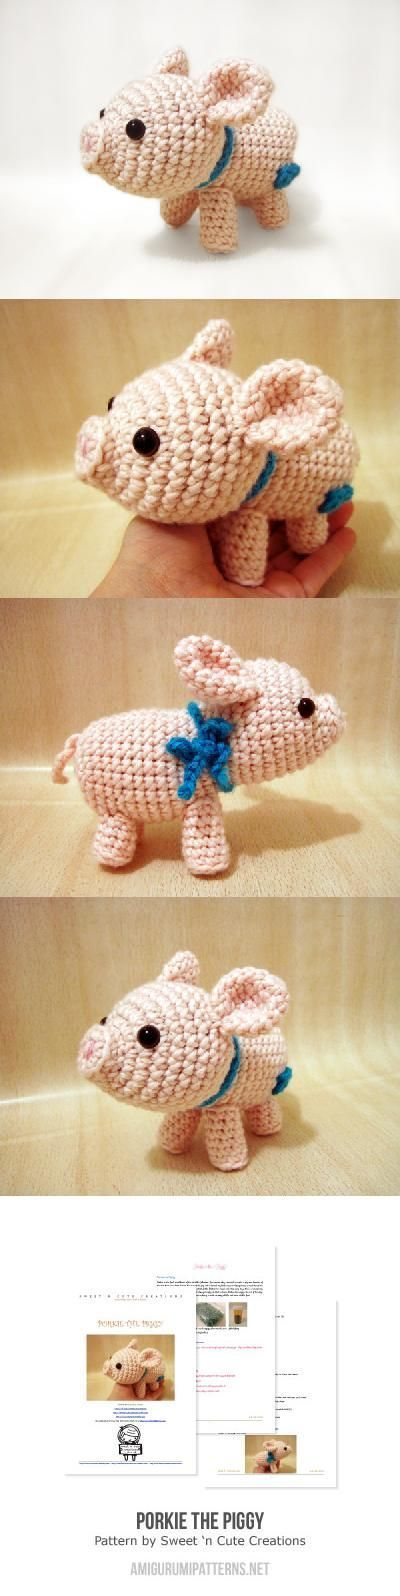 Porkie The Piggy Amigurumi Pattern